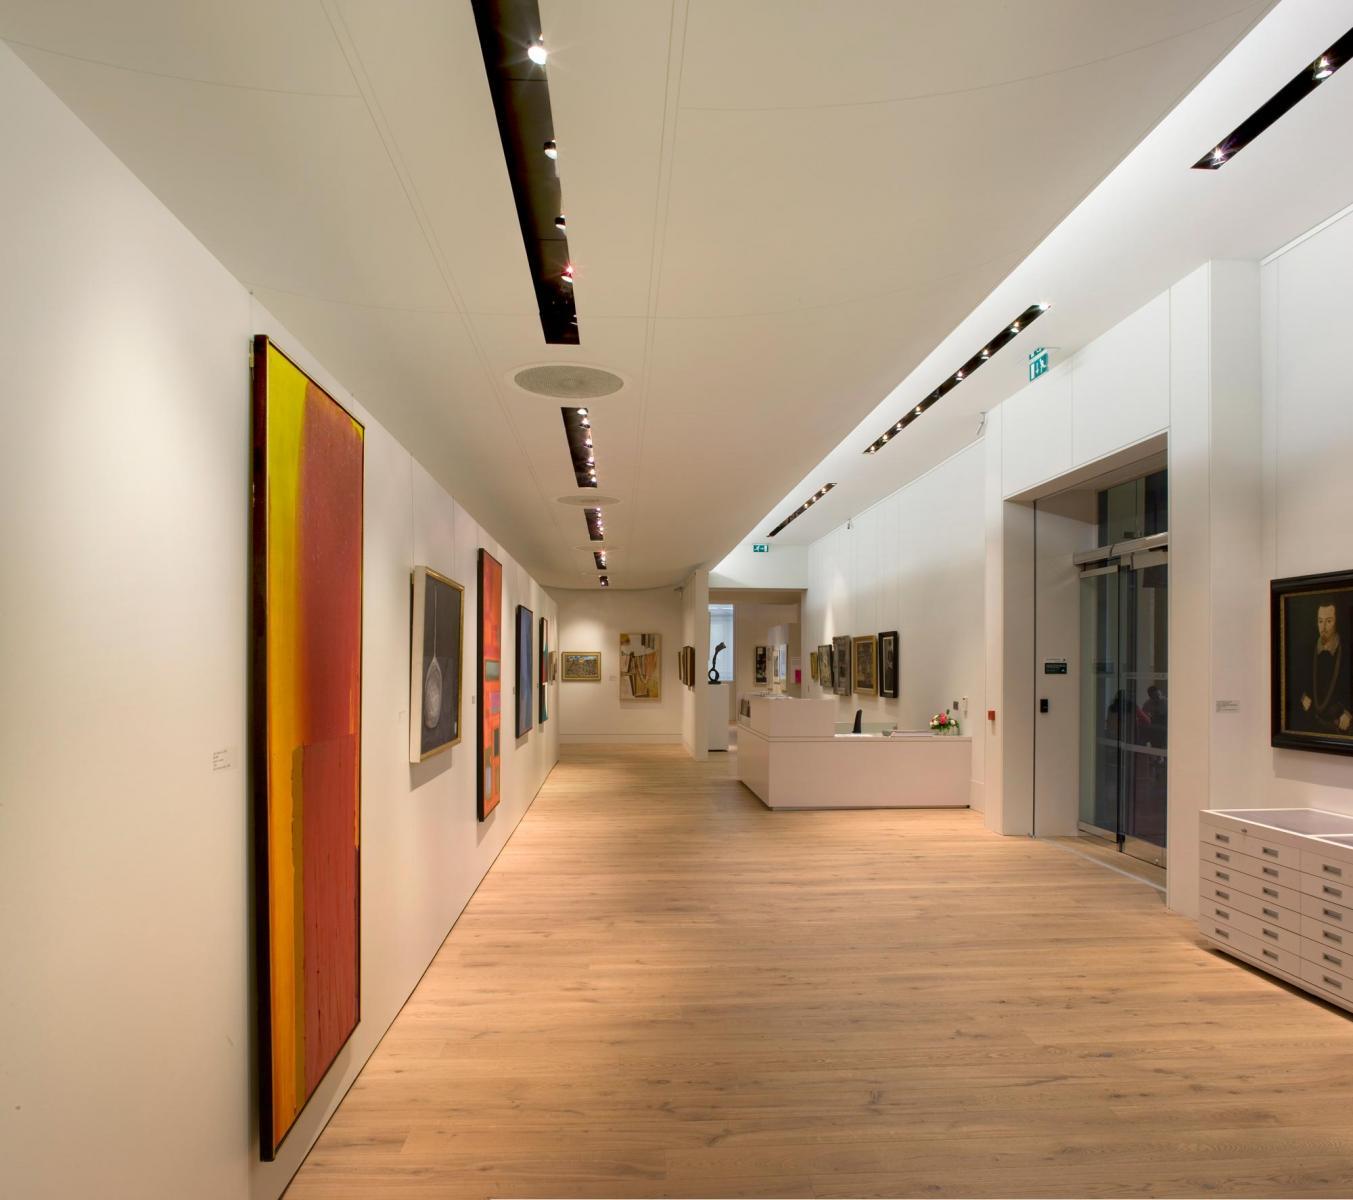 Leeds University Art Gallery